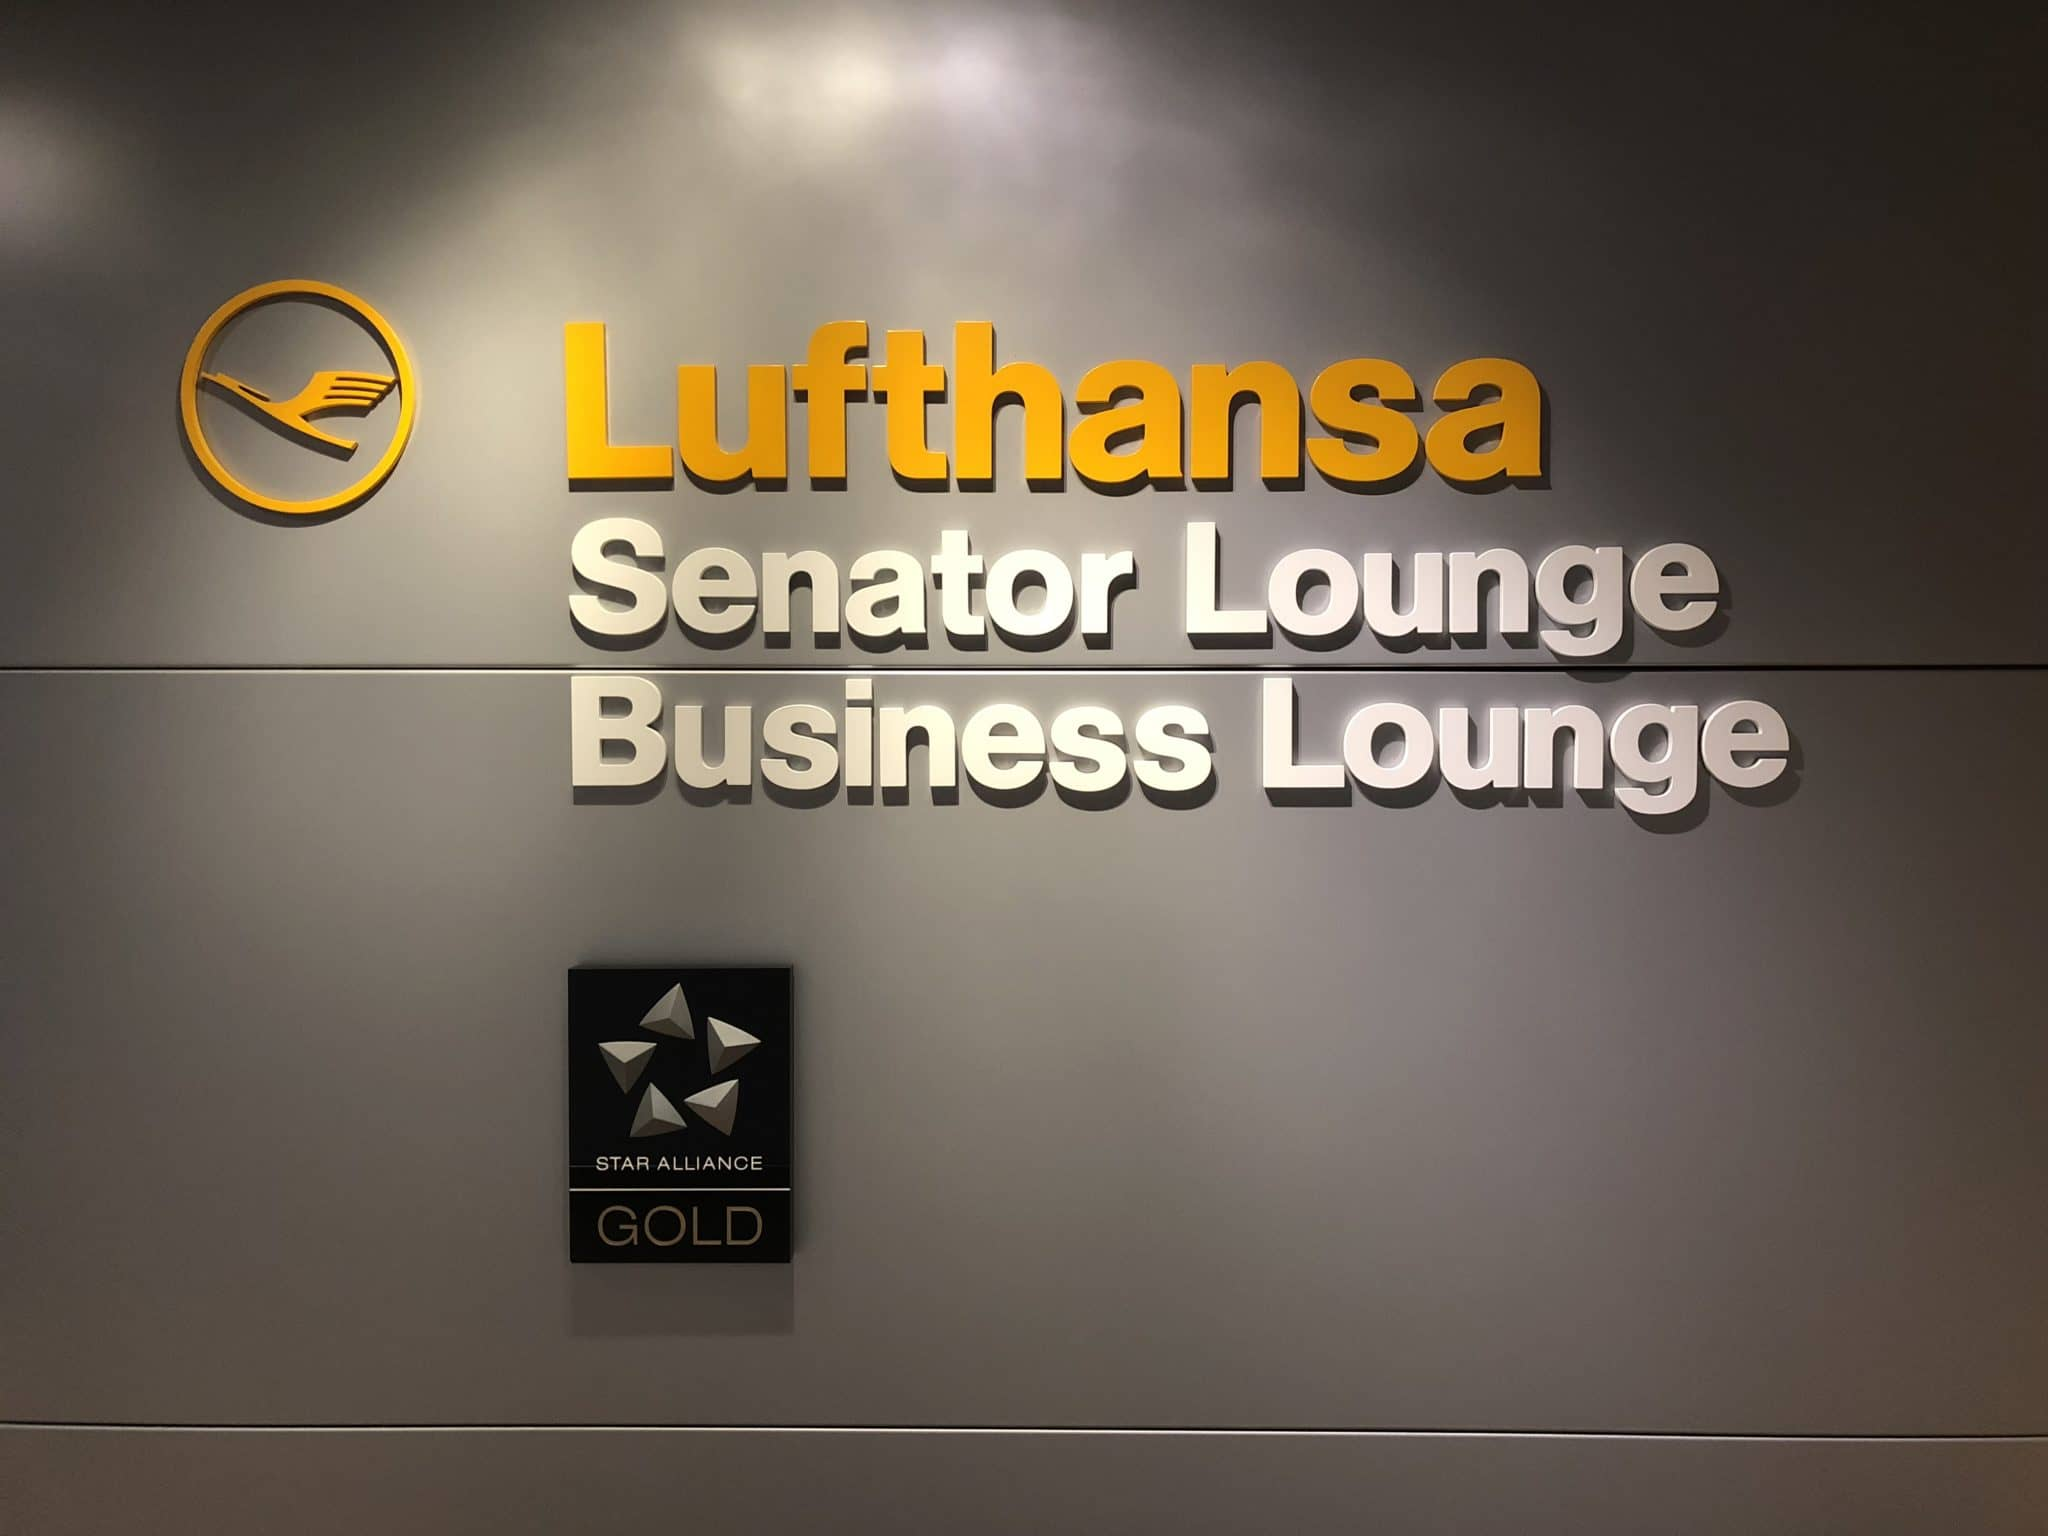 Lufthansa Senator Lounge Hannover Logo